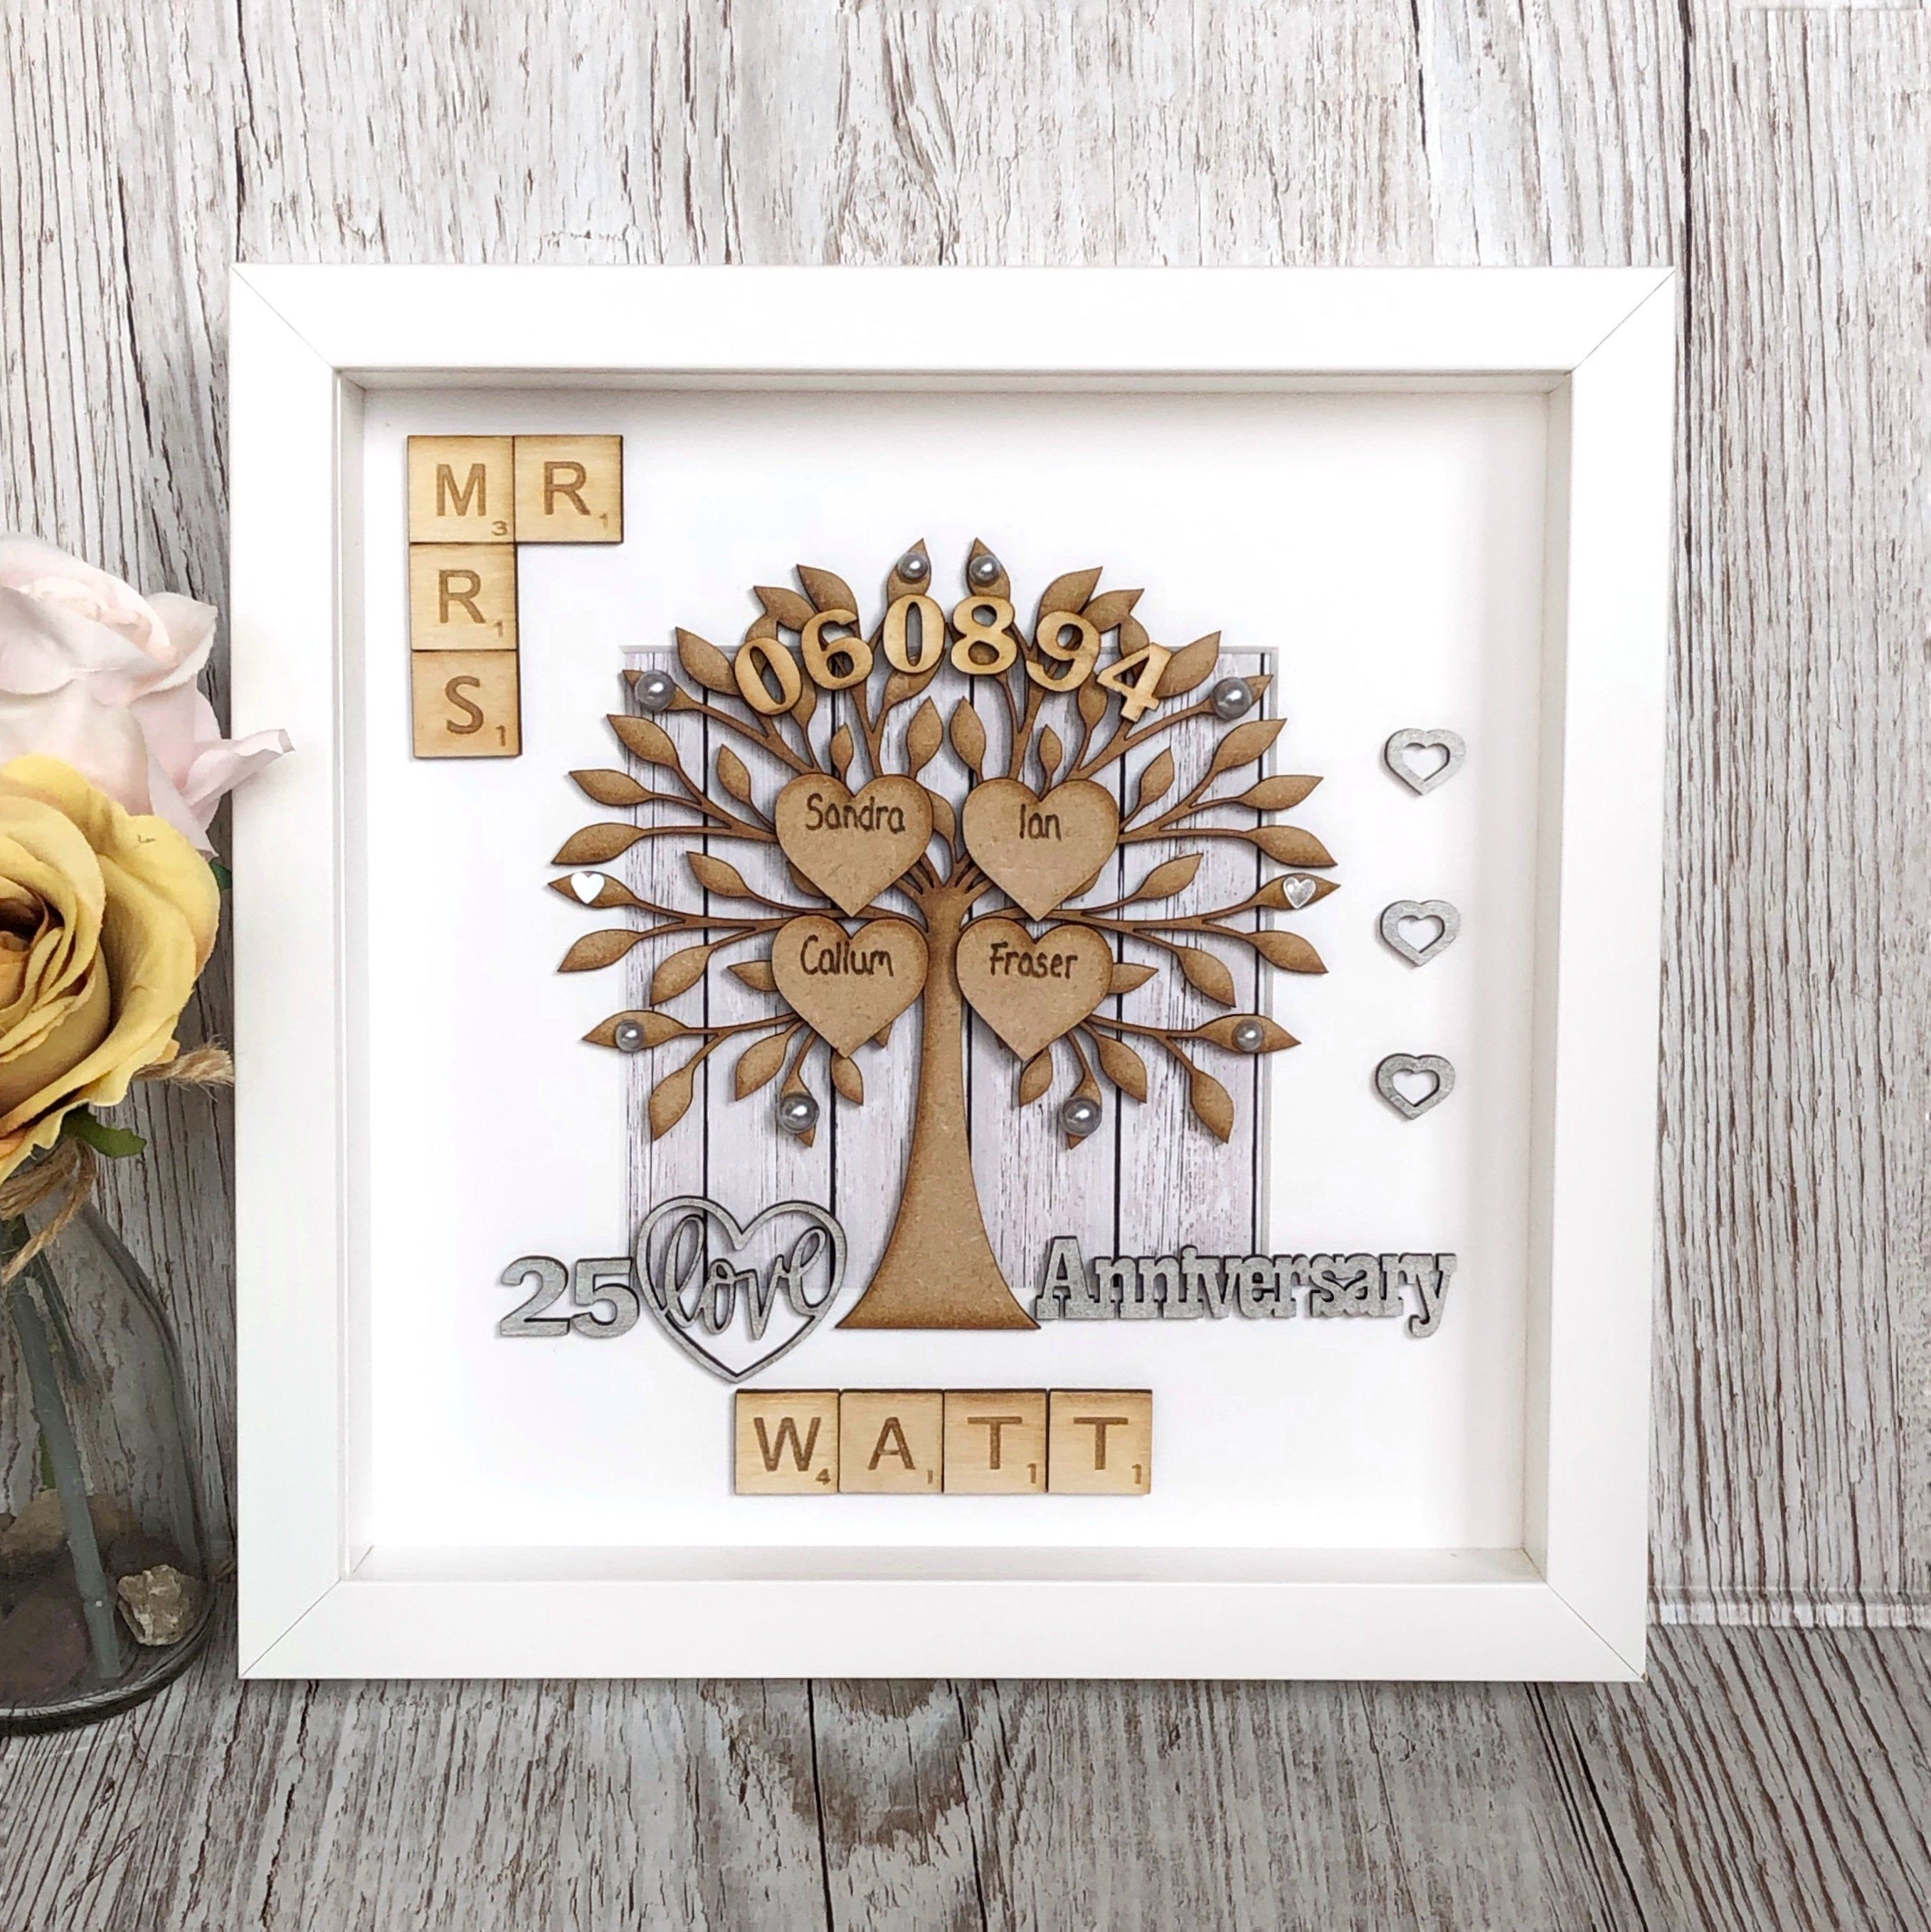 Silver Wedding Anniversary Gift, 25th Anniversary Gift